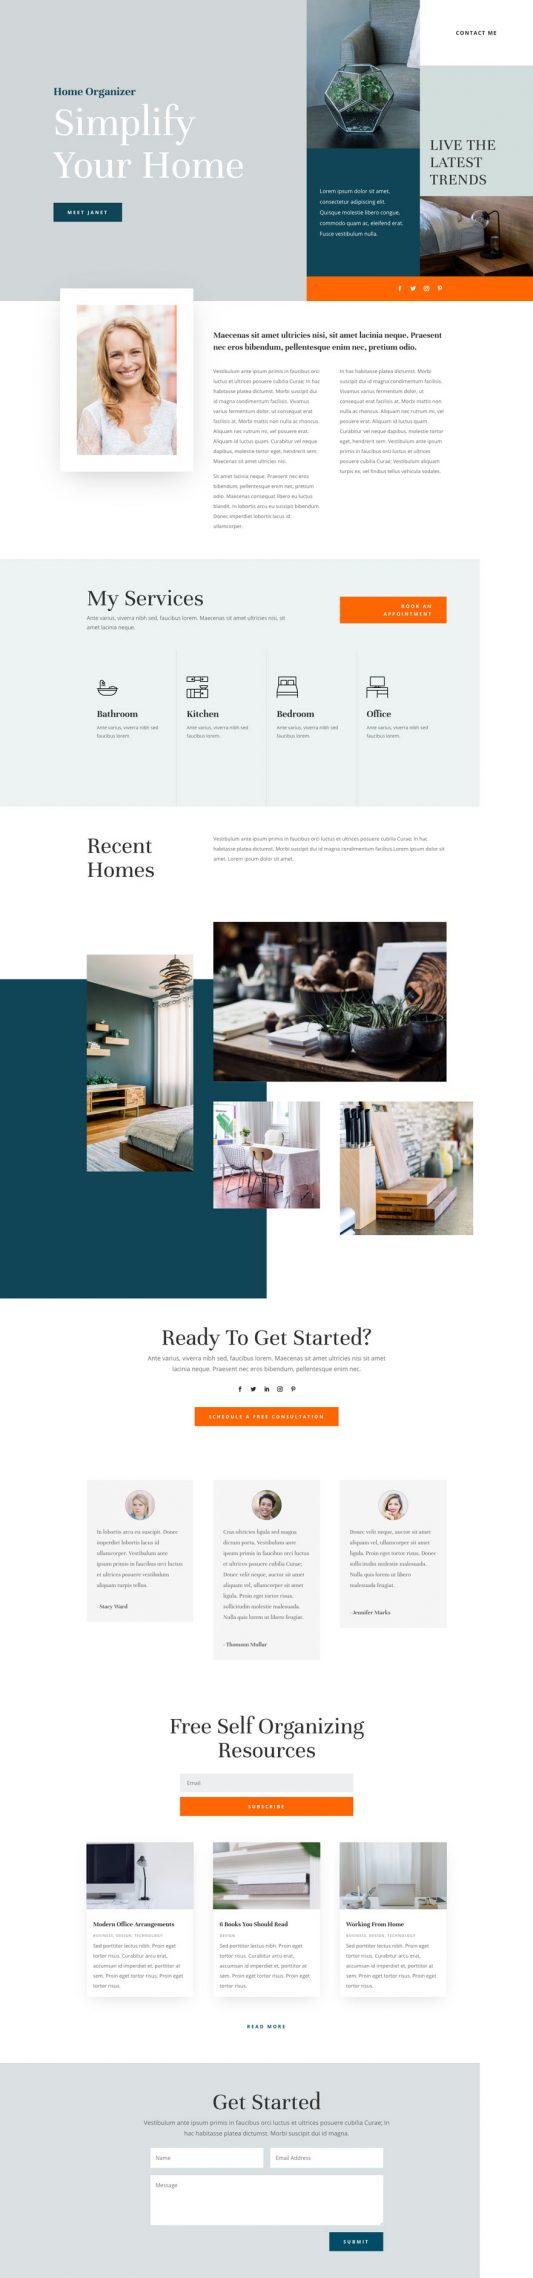 Home Organizer Landing Page